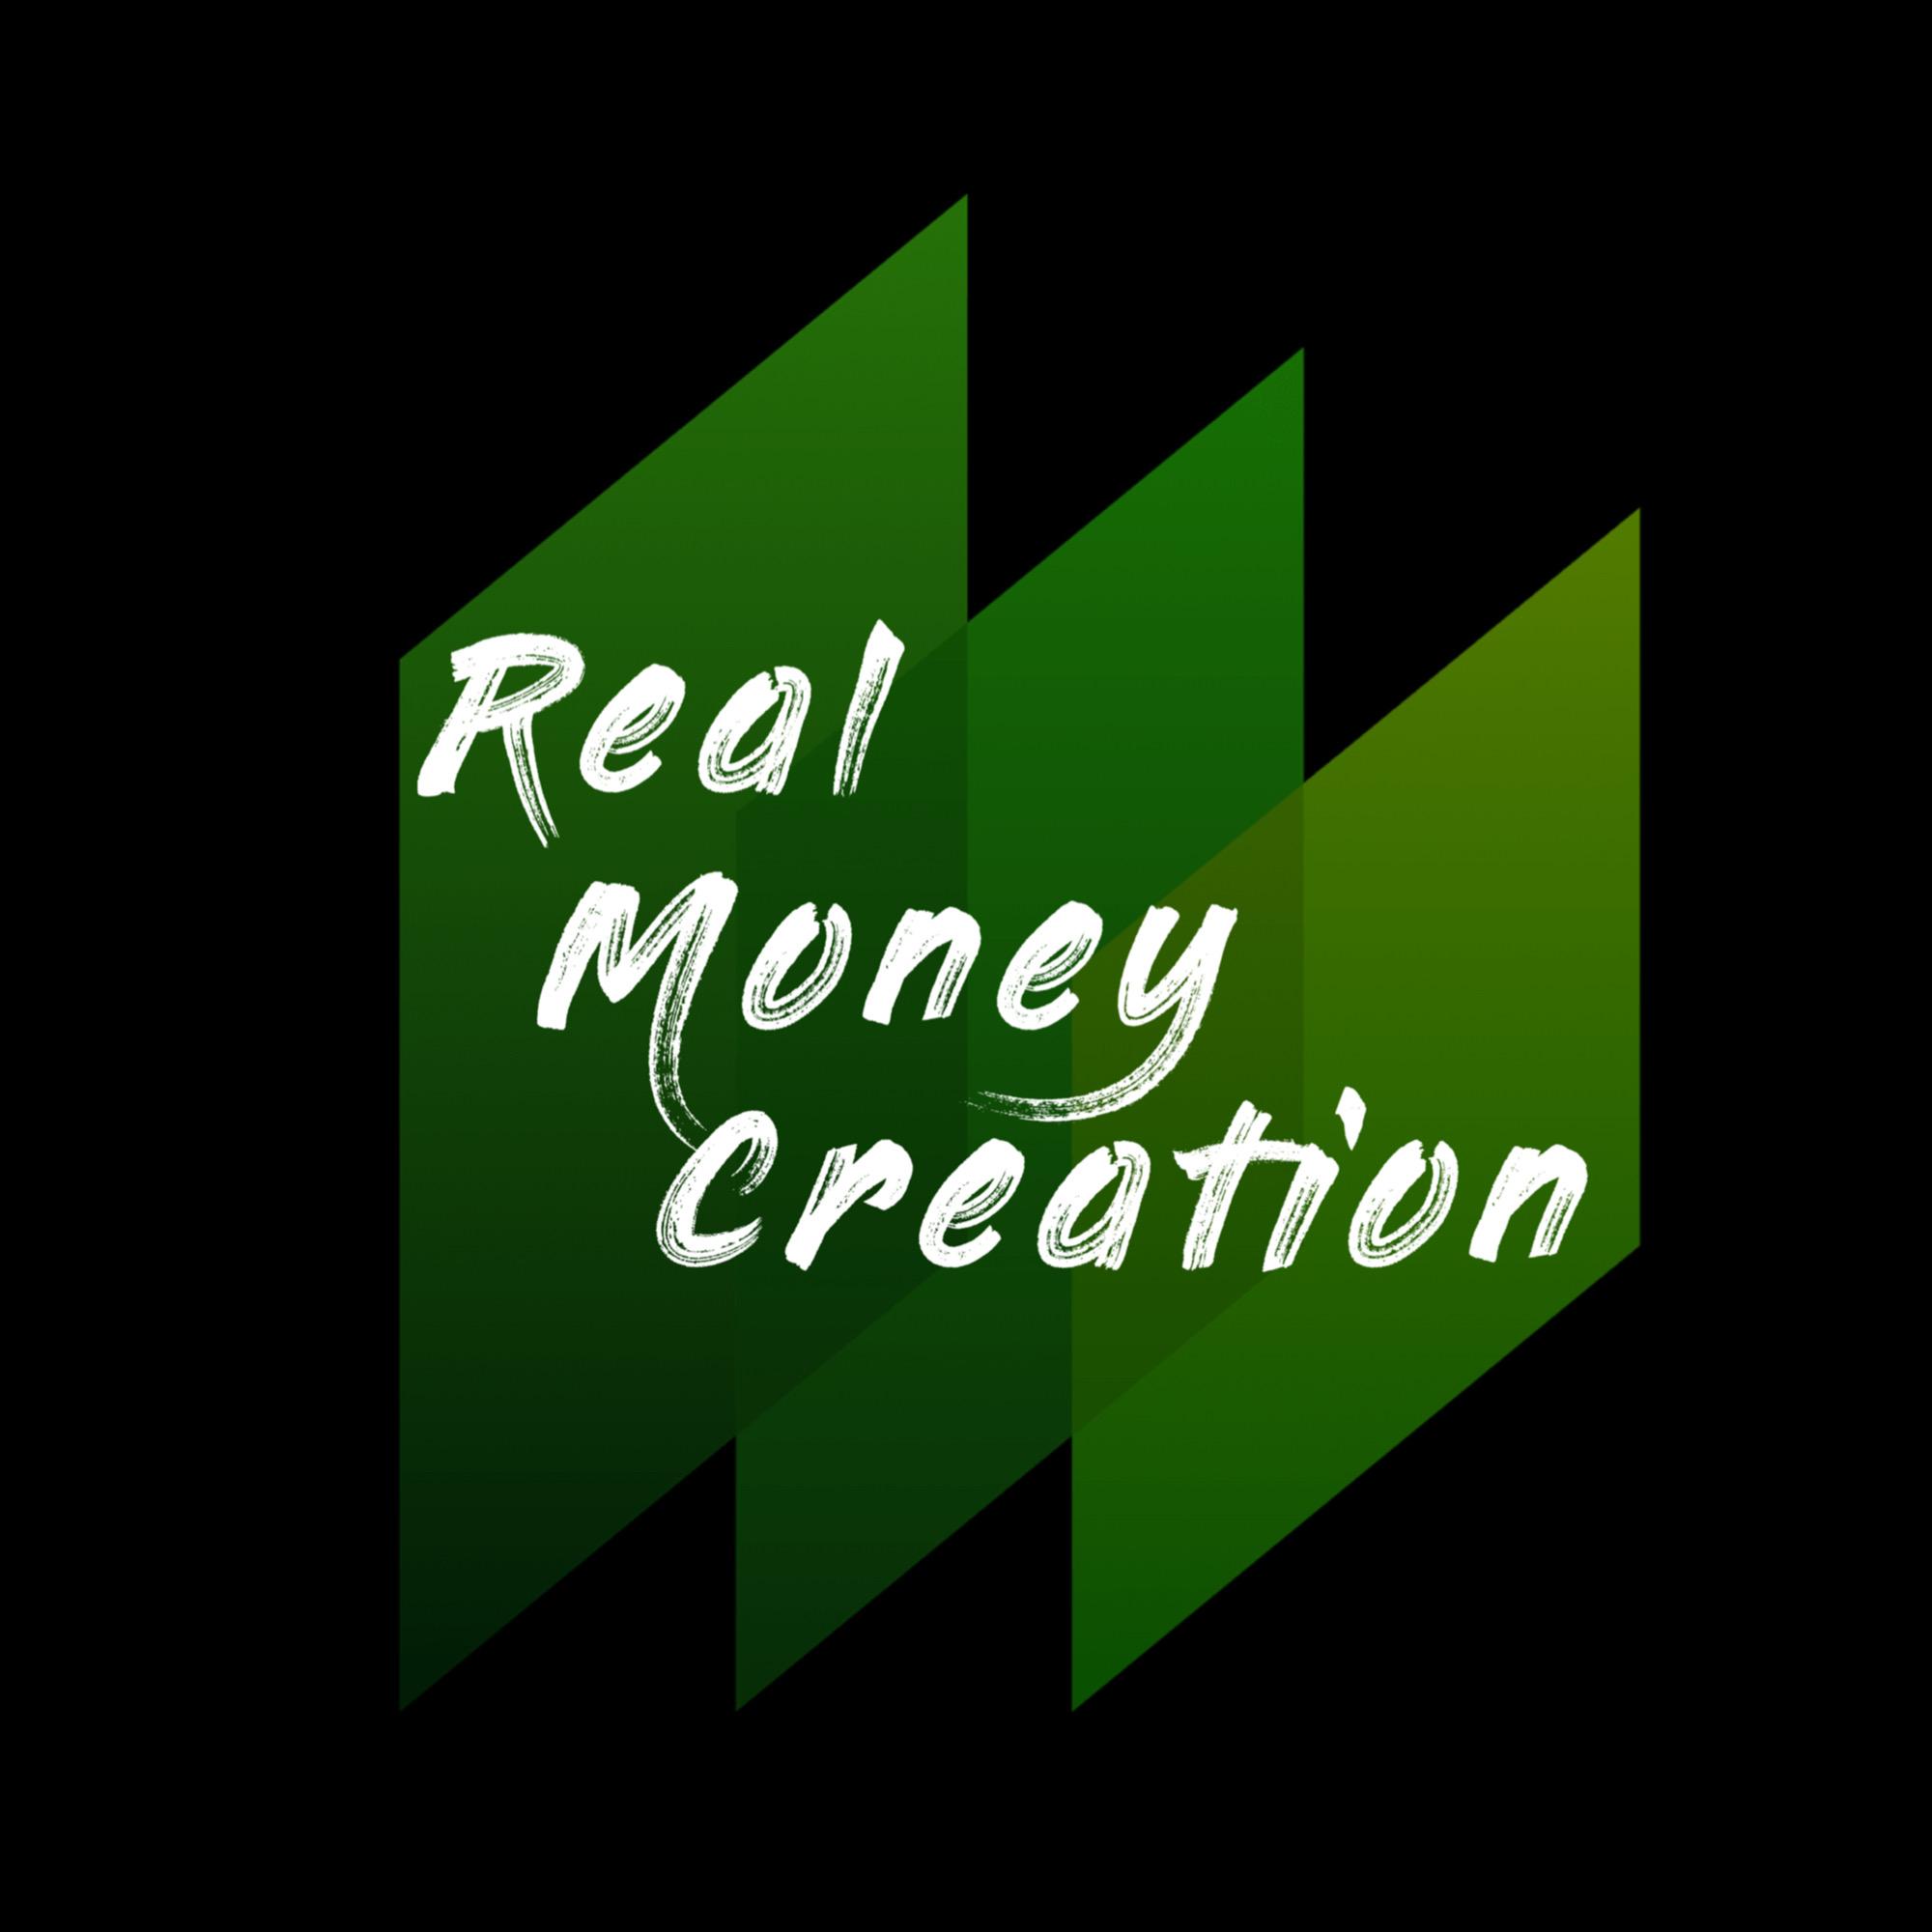 Real Money Creation